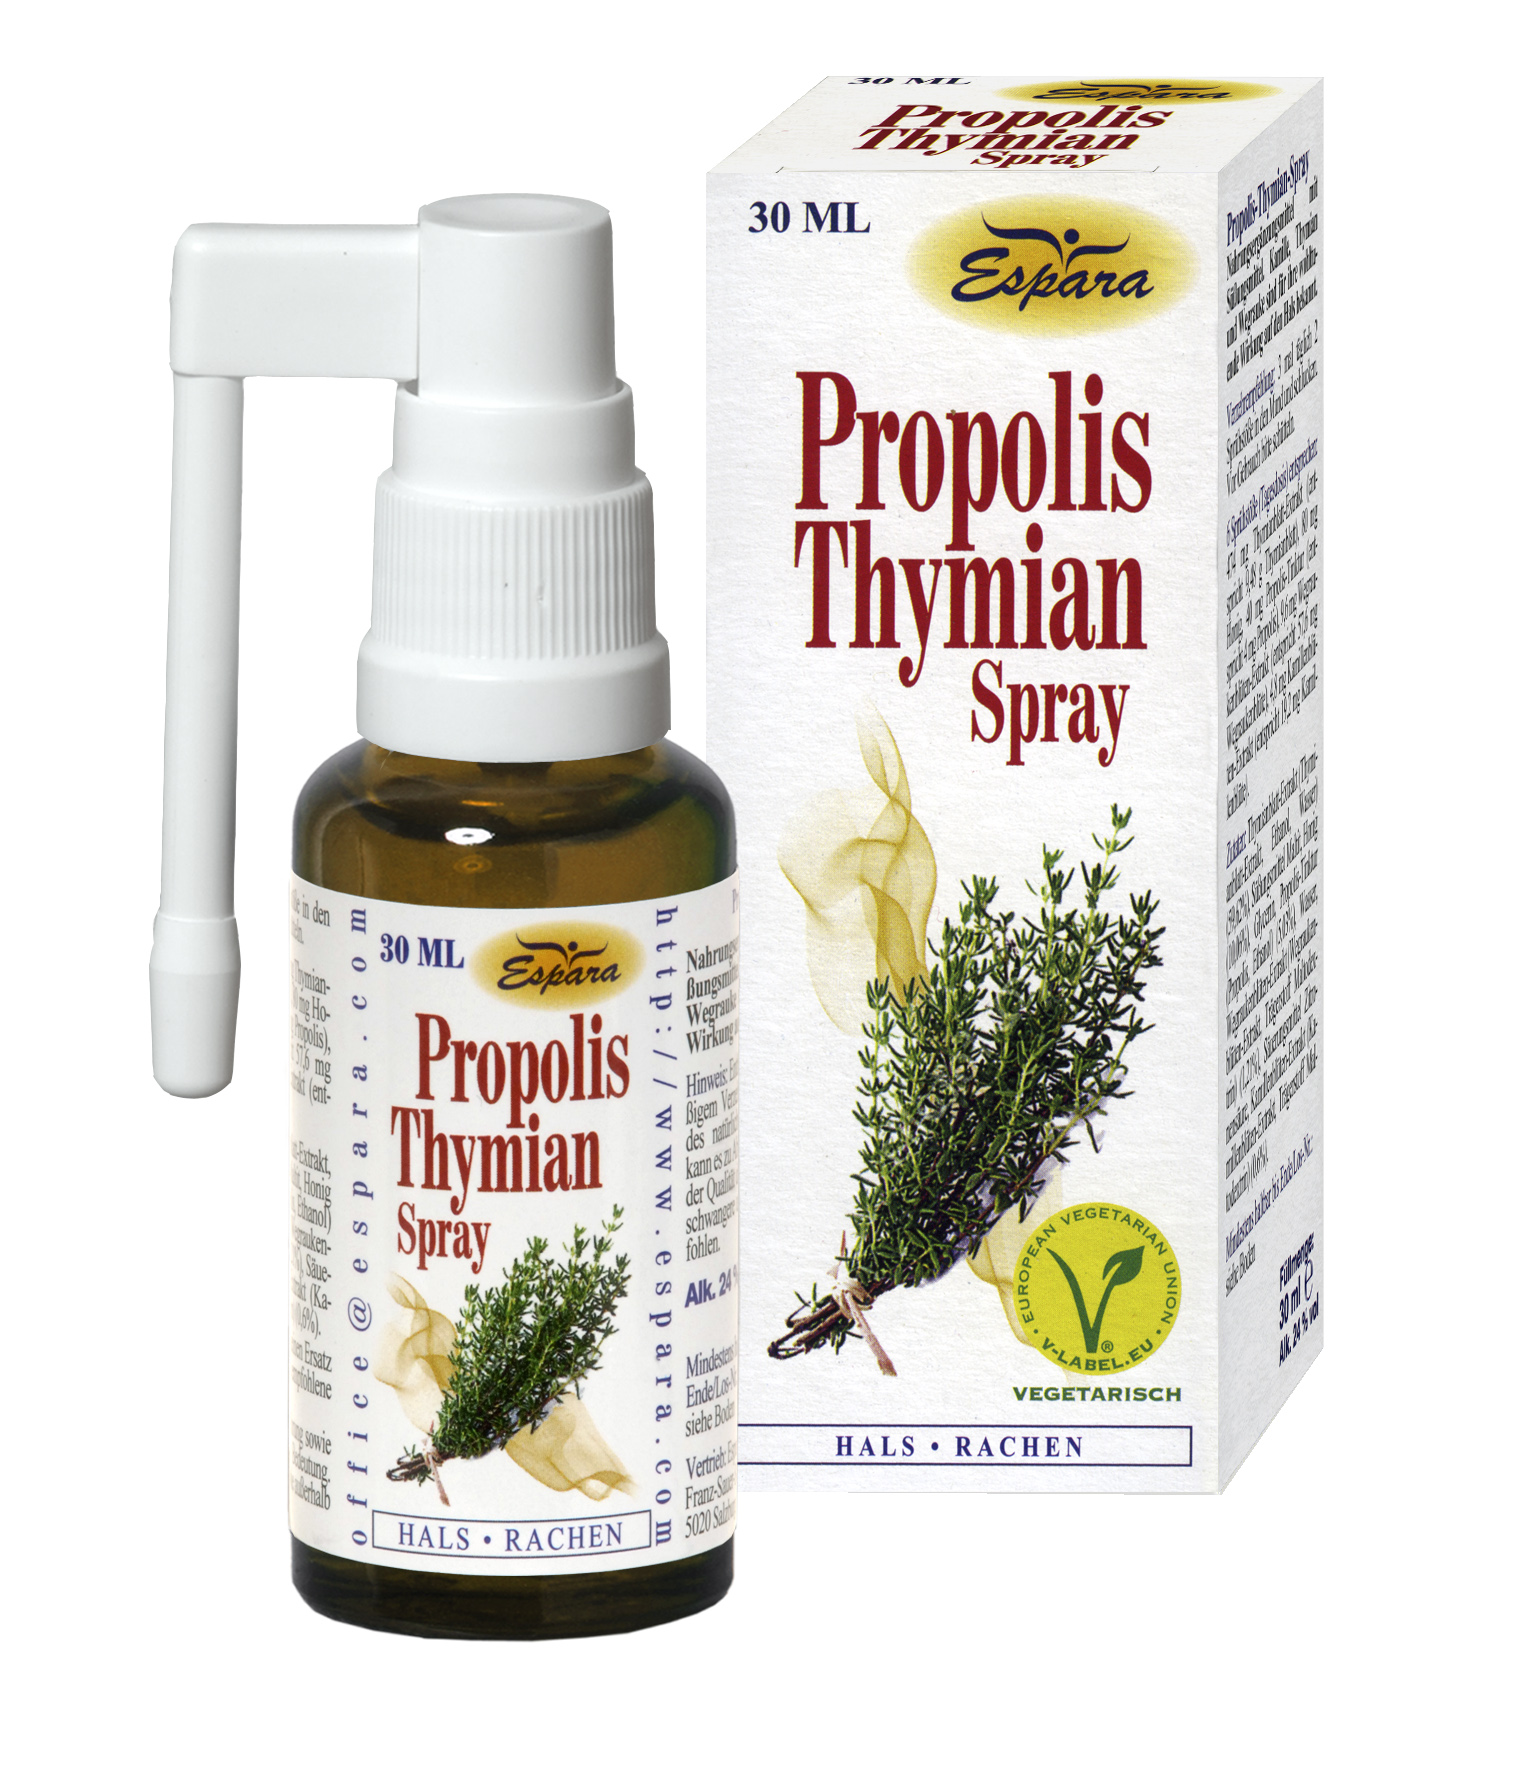 Espara Propolis-Thymian Spray